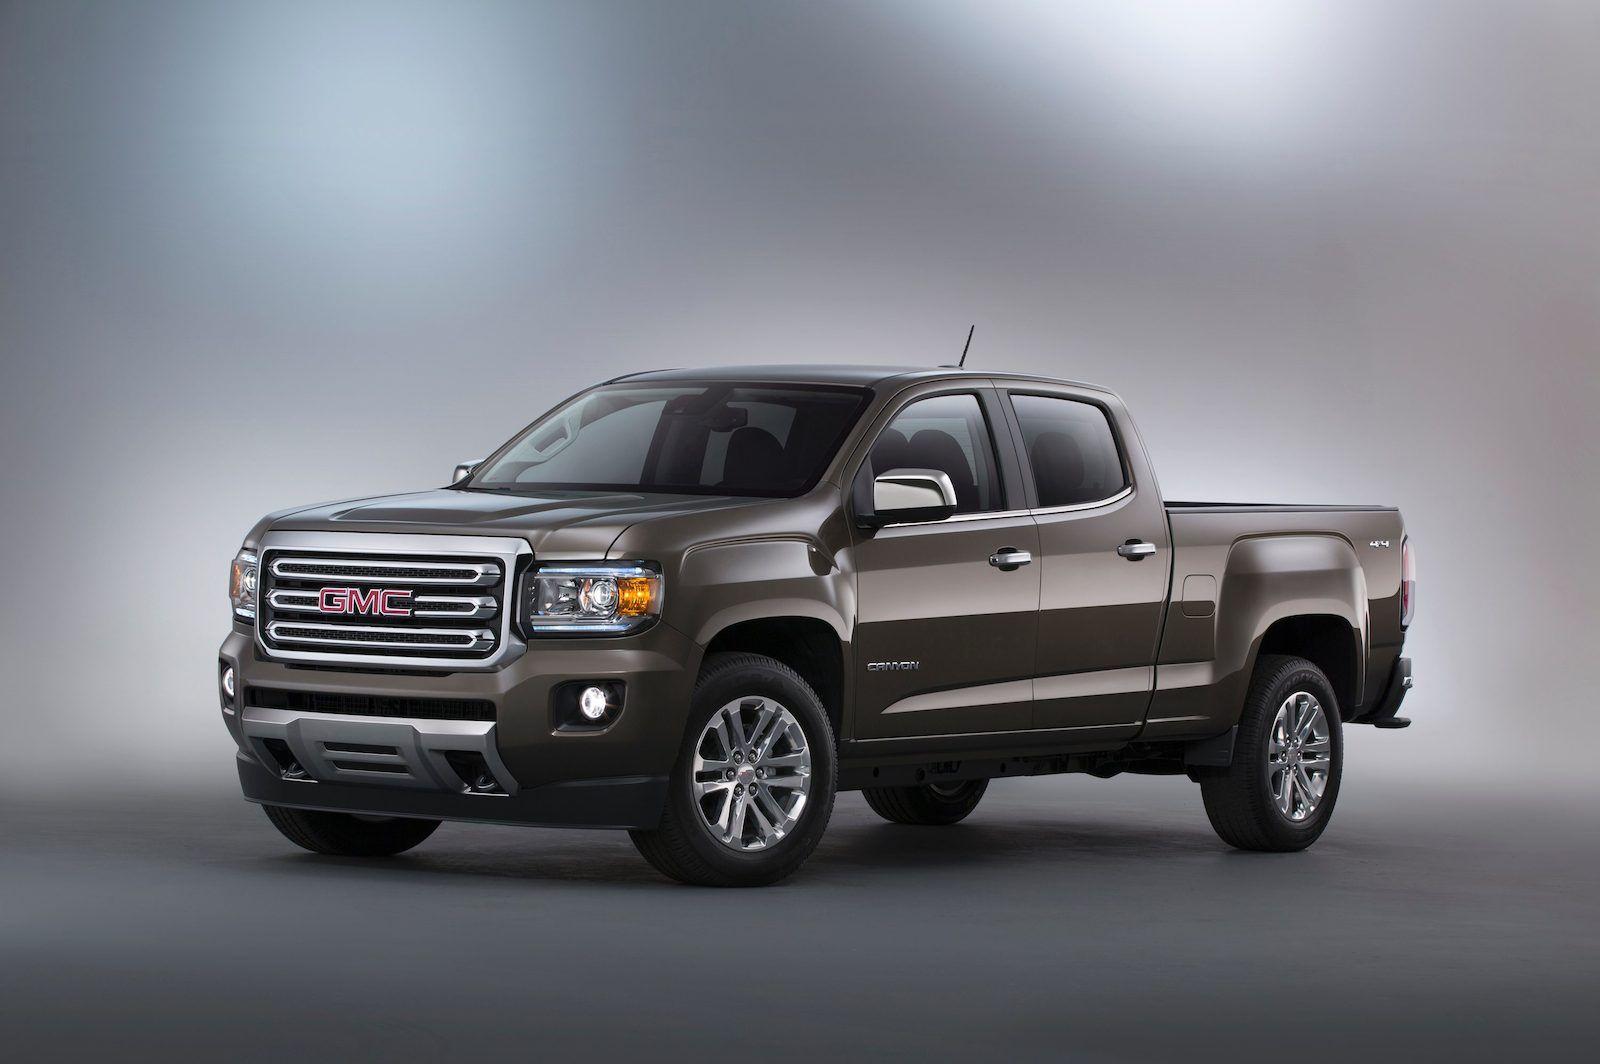 sierra ram compare vs gmc news h trucks